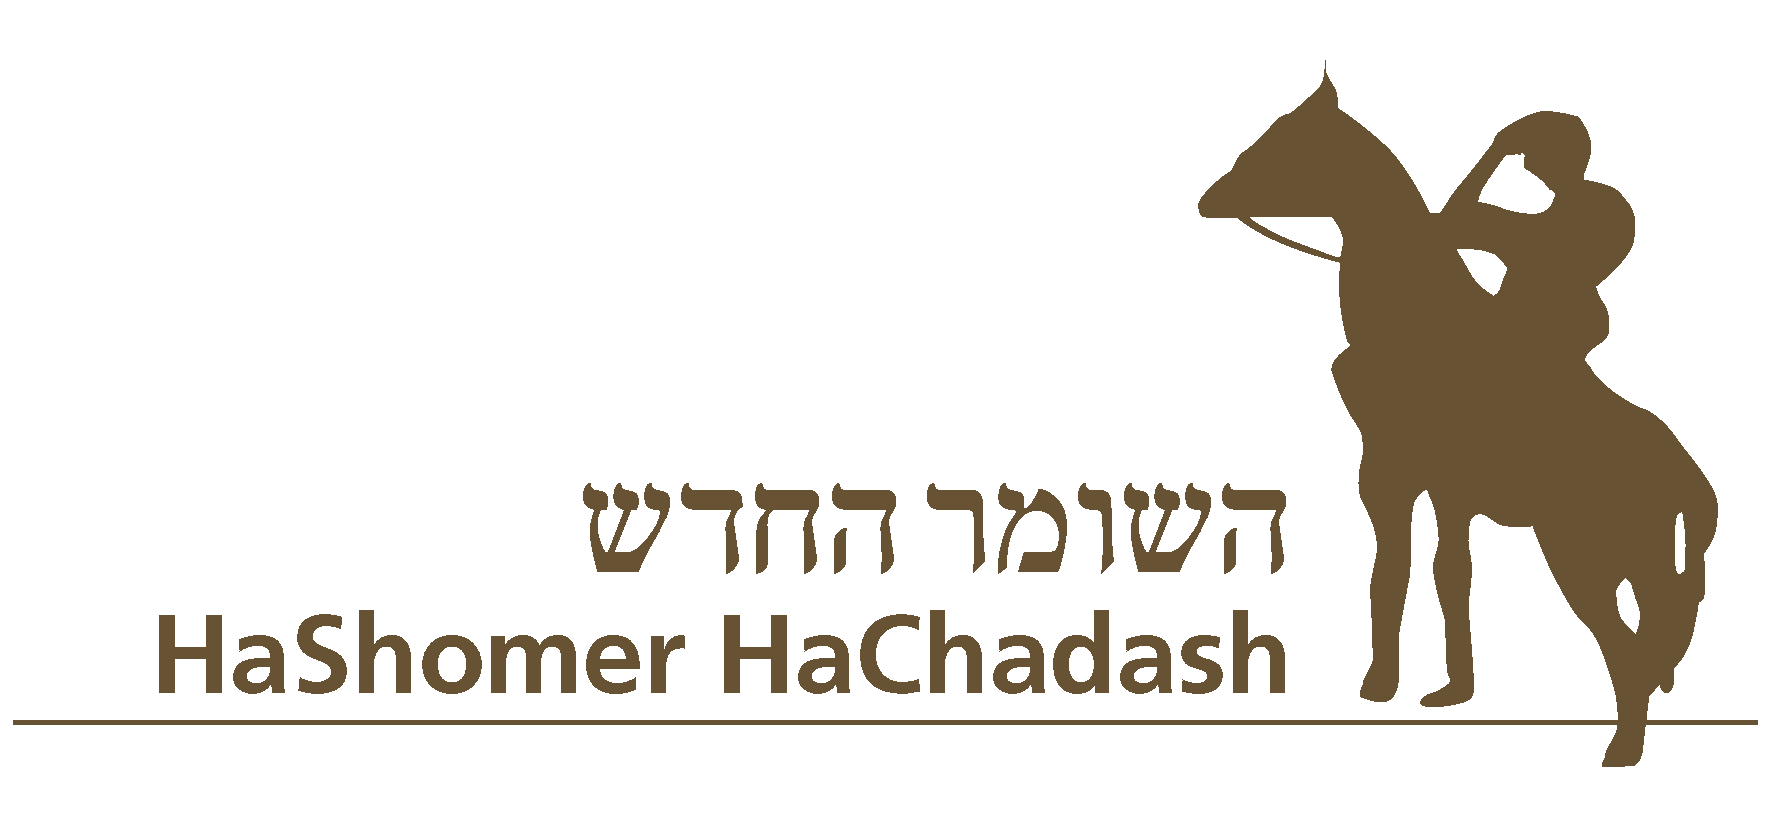 HaShomerNewLogoStamp(1)(1)